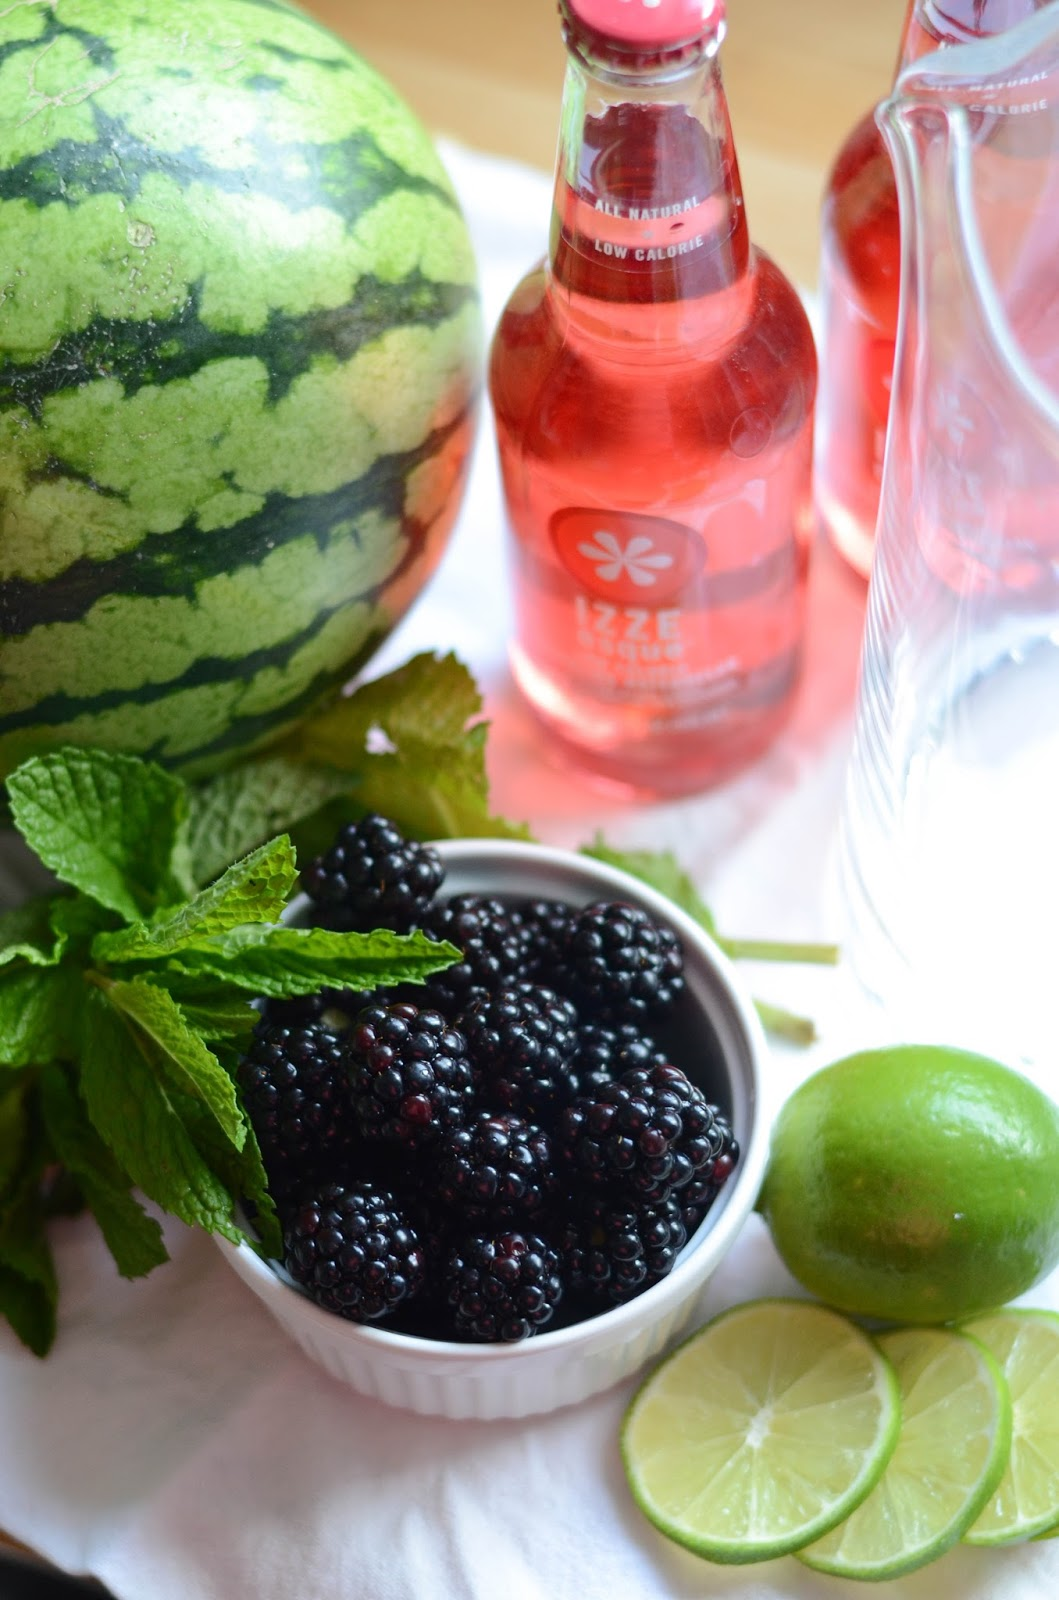 IRON & TWINE: Watermelon Sangria